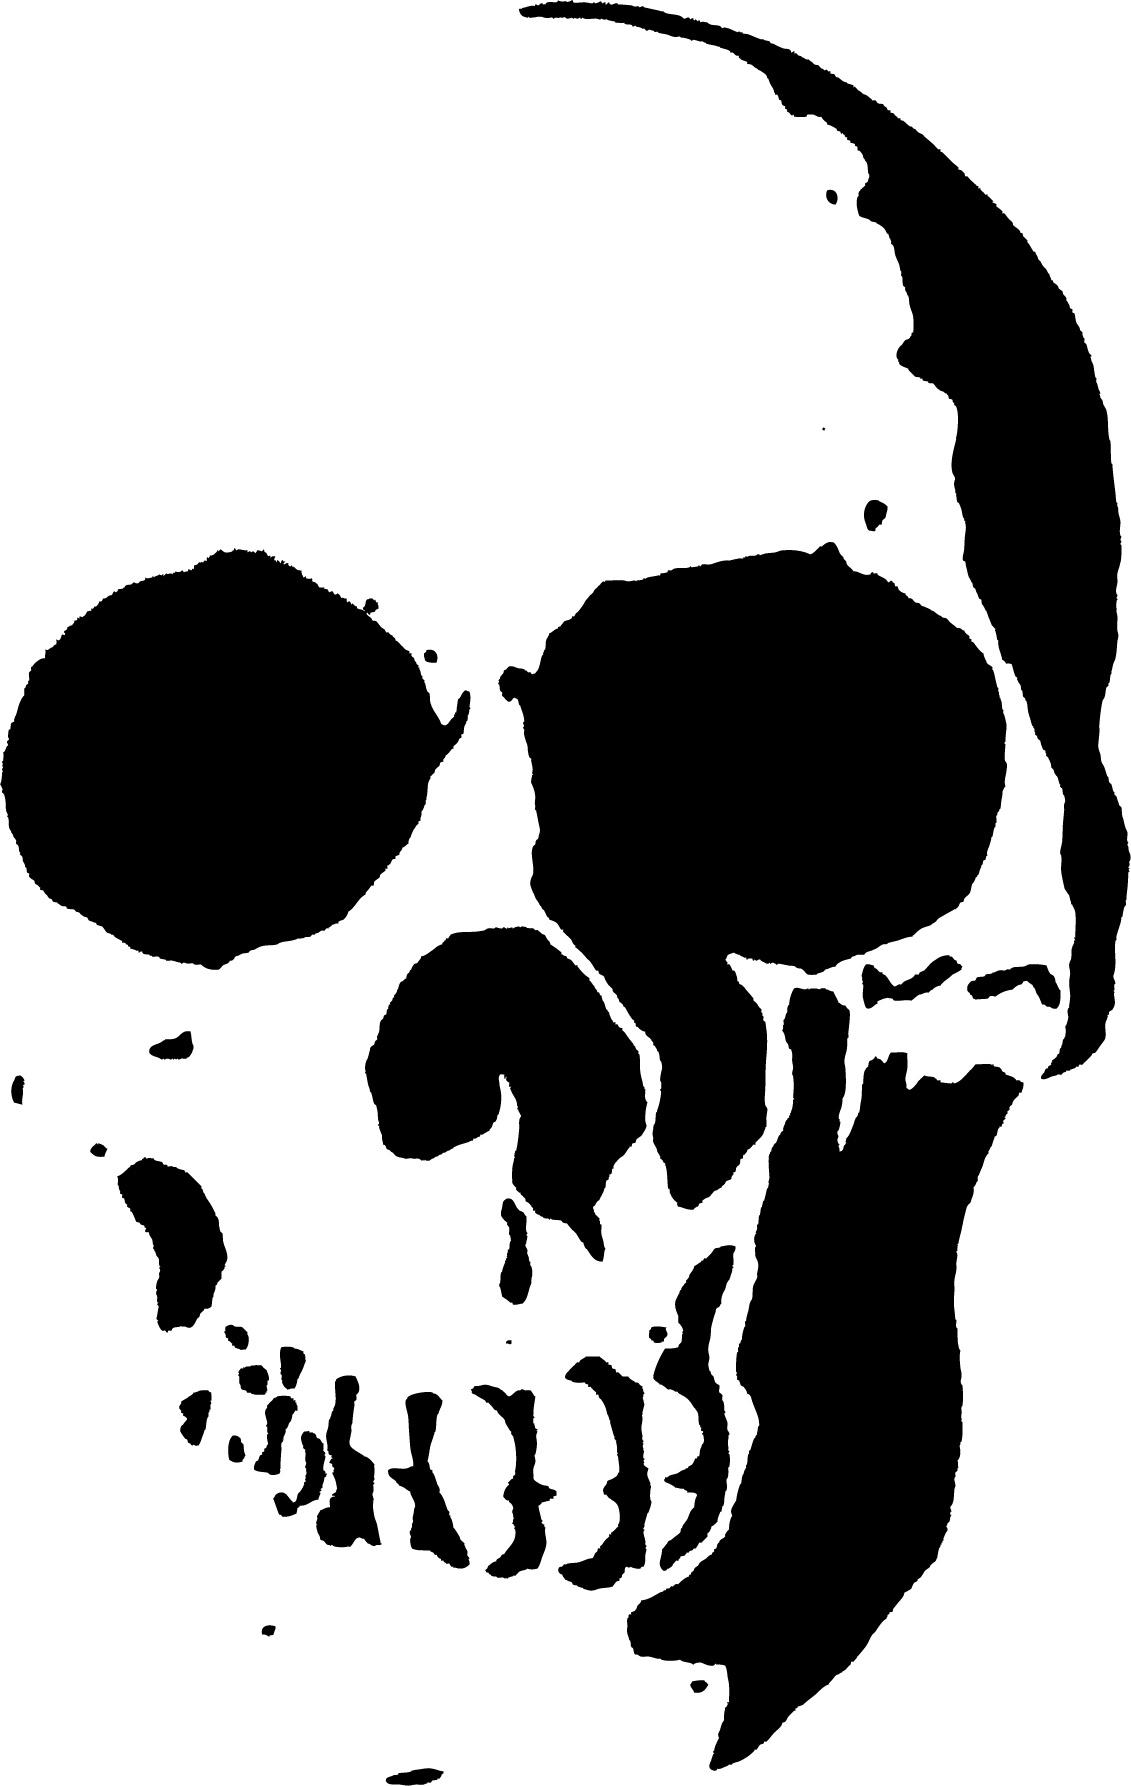 23 Free Skull Stencil Printable Templates   Guide Patterns - Skull Stencils Free Printable